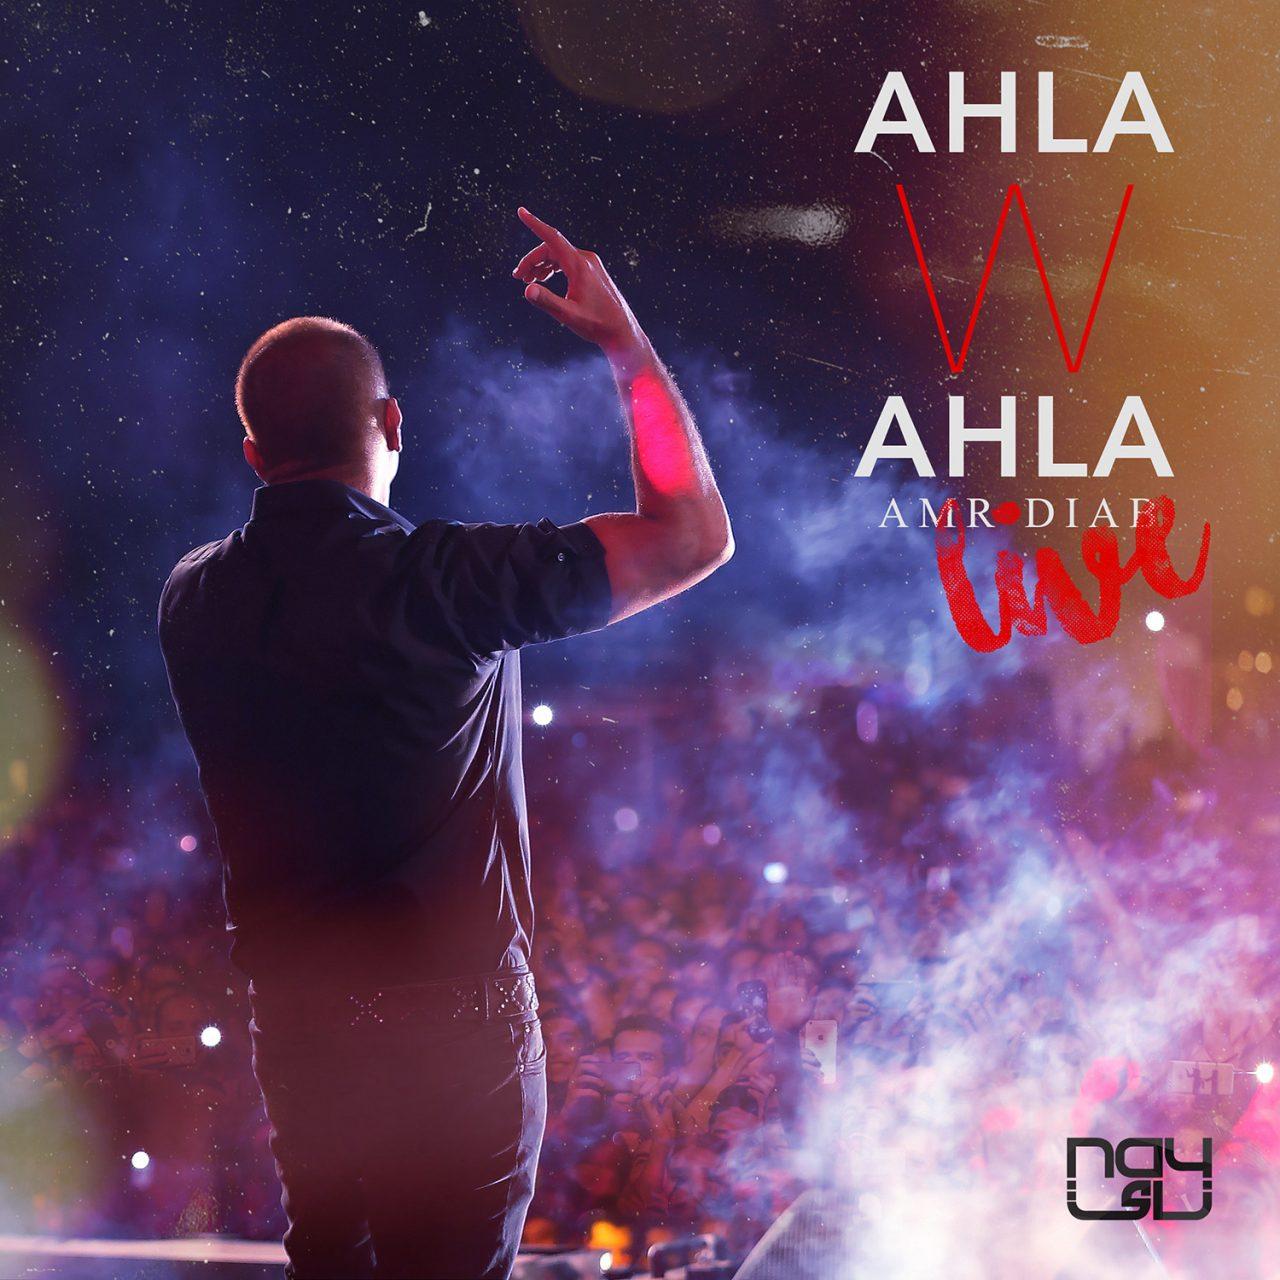 Ahla W Ahla Live, Amr Diab